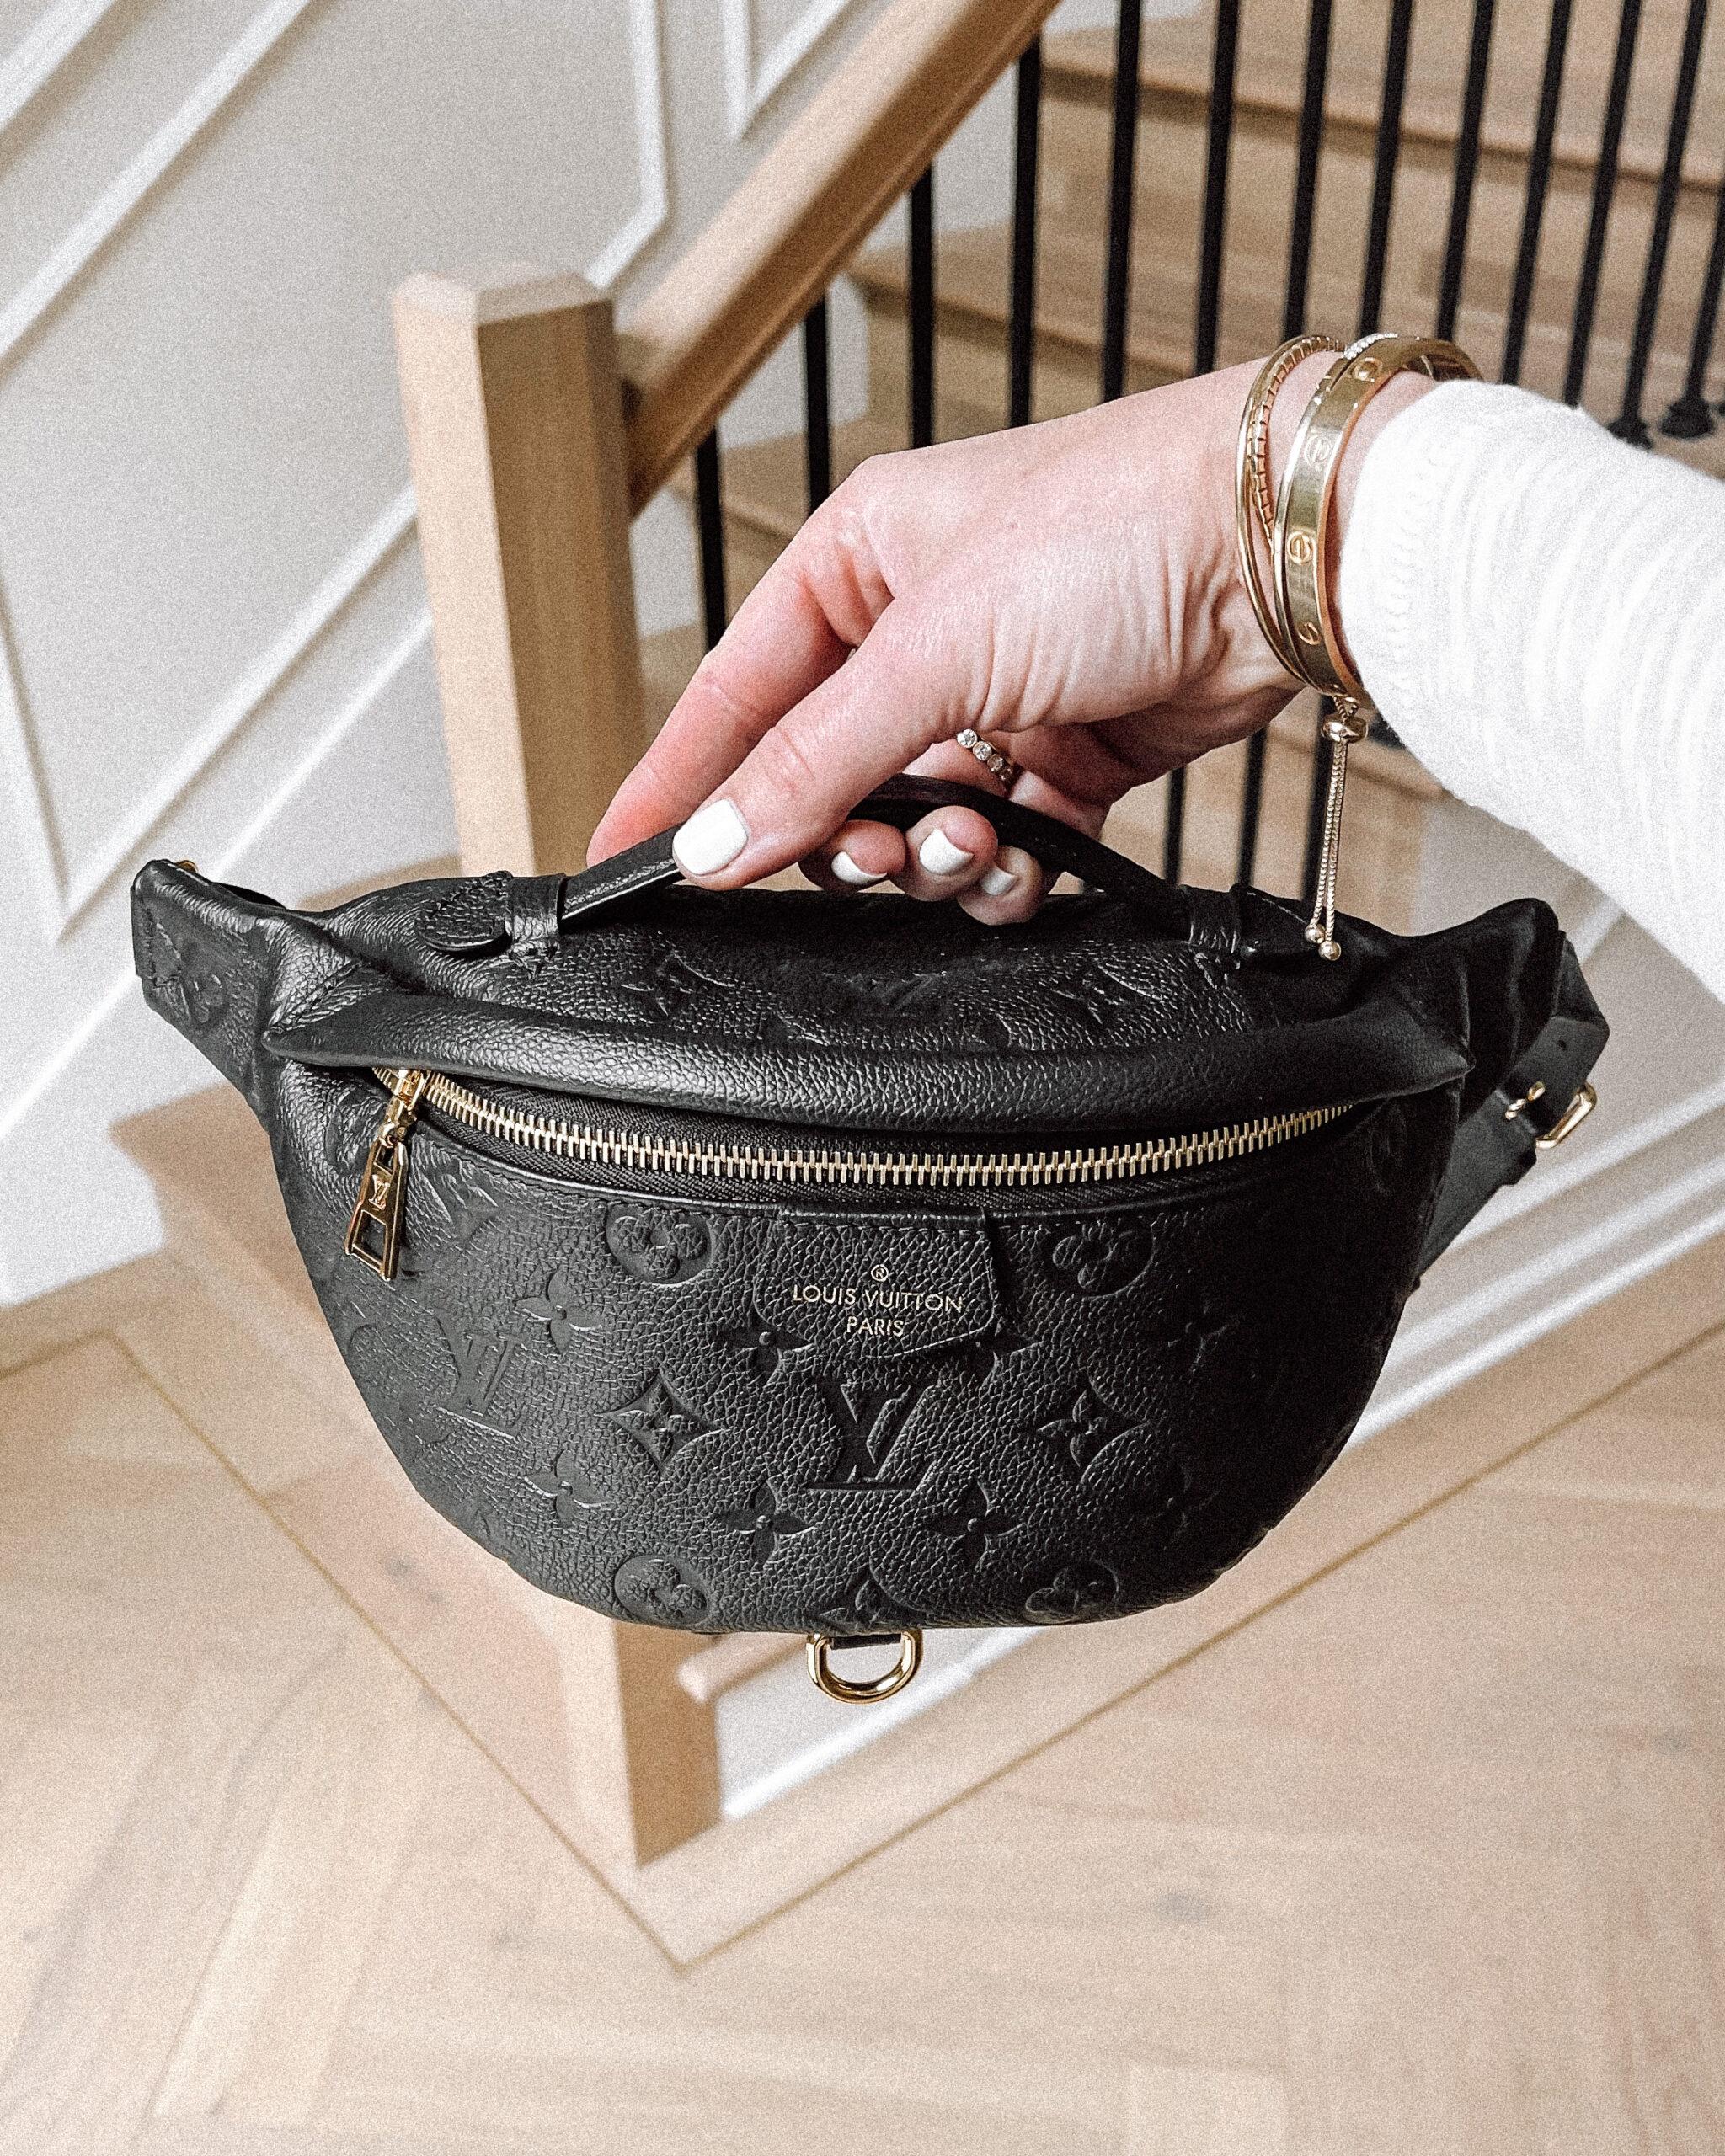 Fashion Jackson Louis Vuitton Empreinte BumBag Black Fashionphile